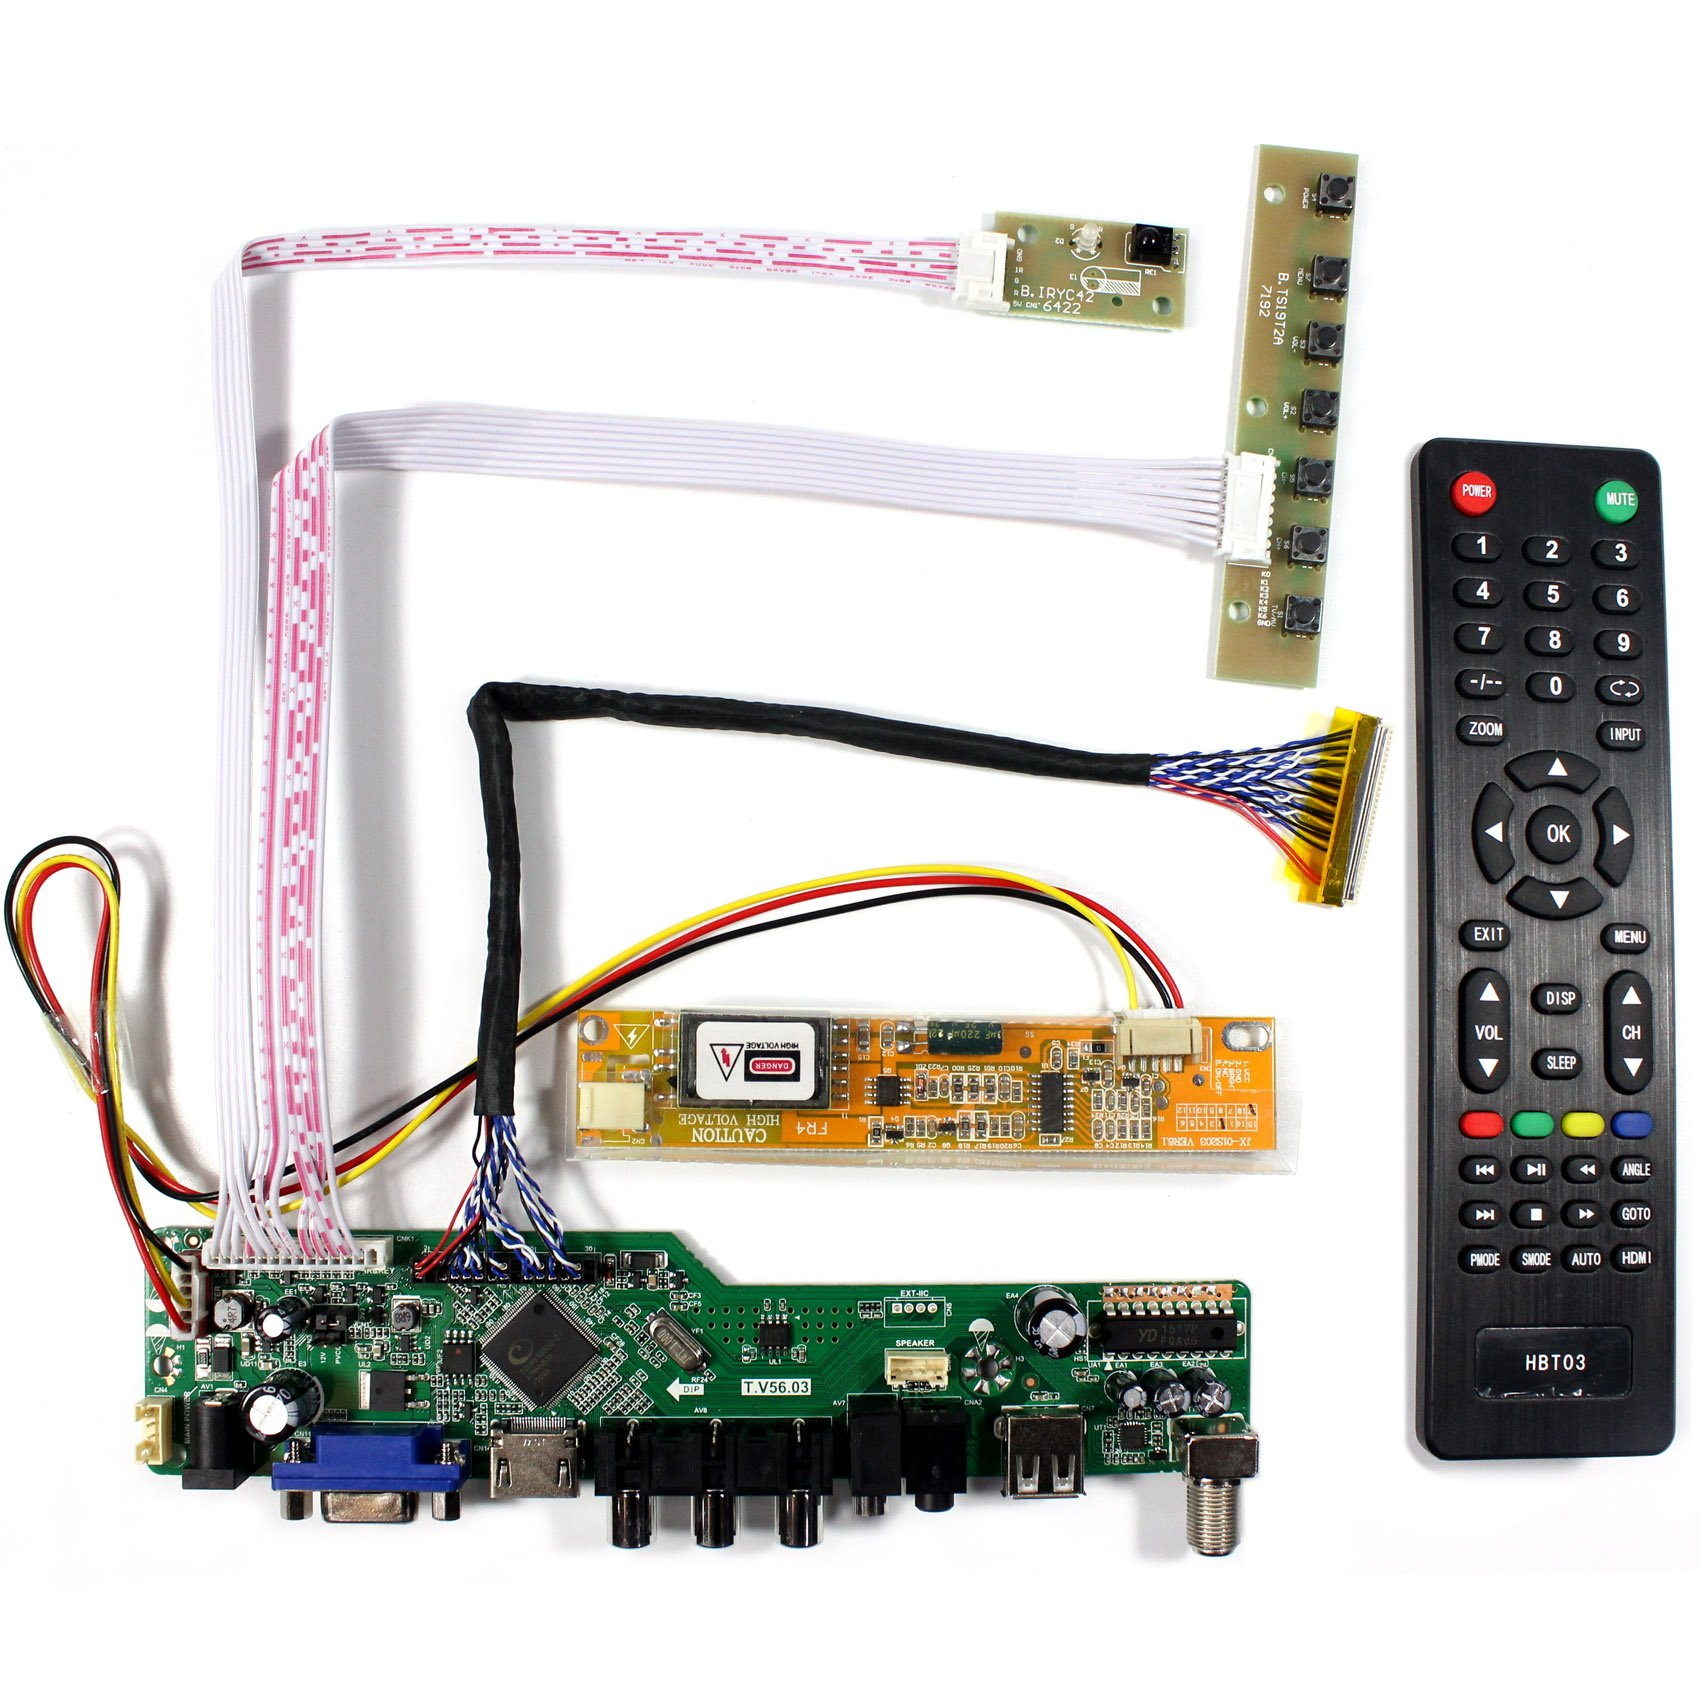 VSDISPLAY HDMI+VGA+CVBS+USB+RF+Audio LCD Motor Driver Board Controller Kit Work For 15.4'' 17'' N154C3 B170PW03 B170PW06 1440x900 1CCFL 30Pin LCD Panel